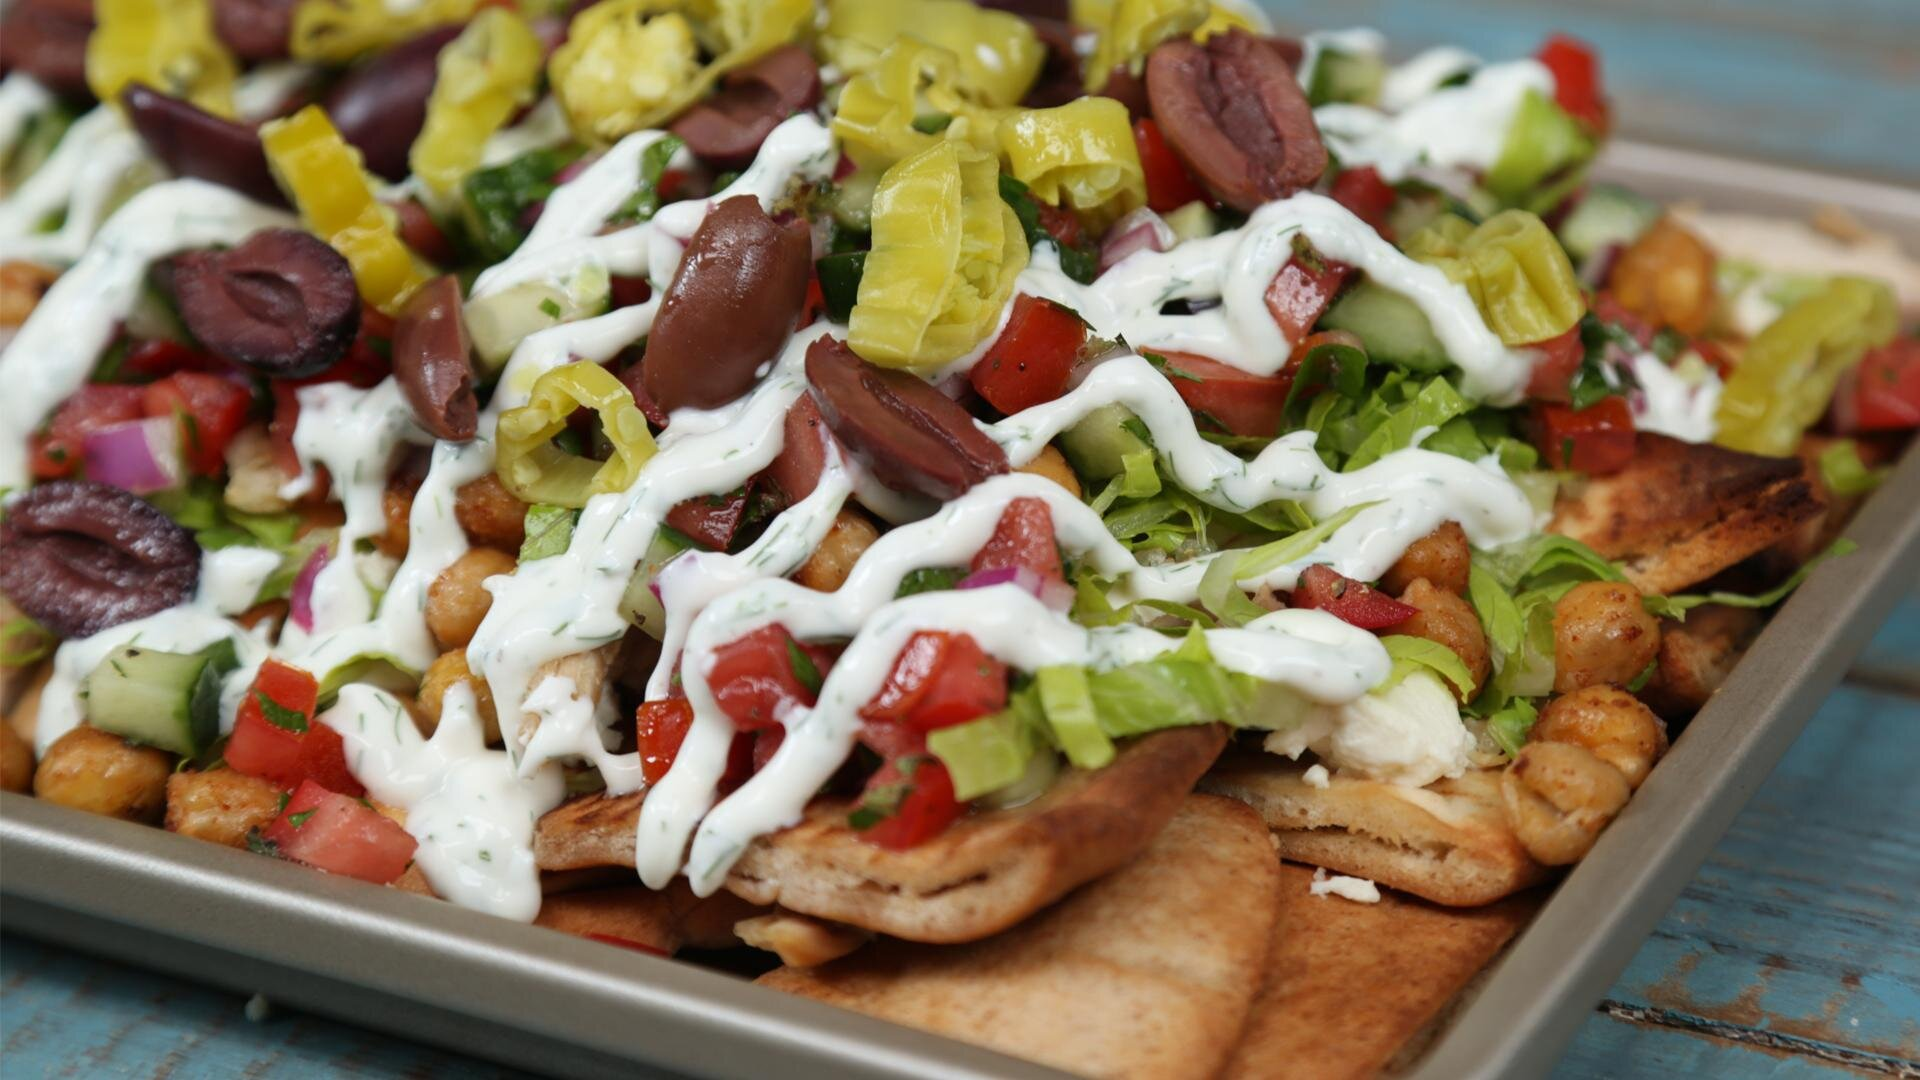 How to Make Loaded Greek Salad Nachos